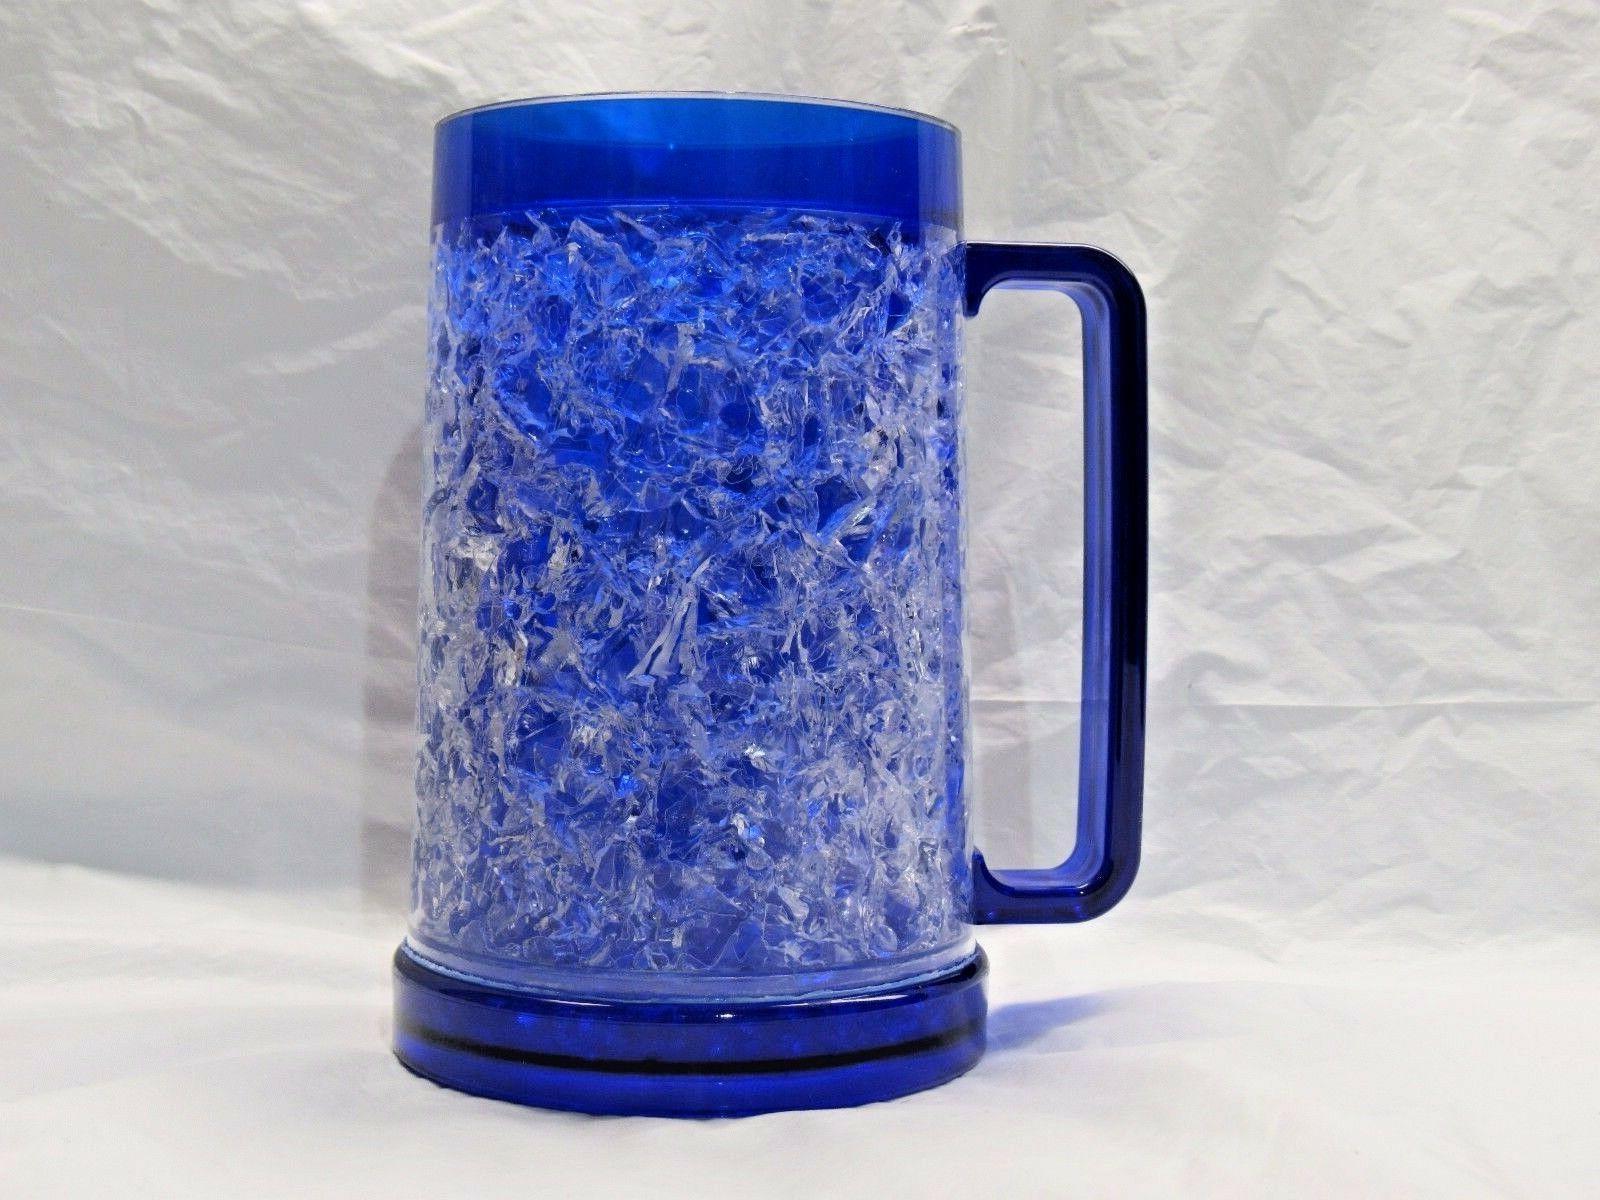 NFL Freezer Mug Color Insert by -Select- Team Below